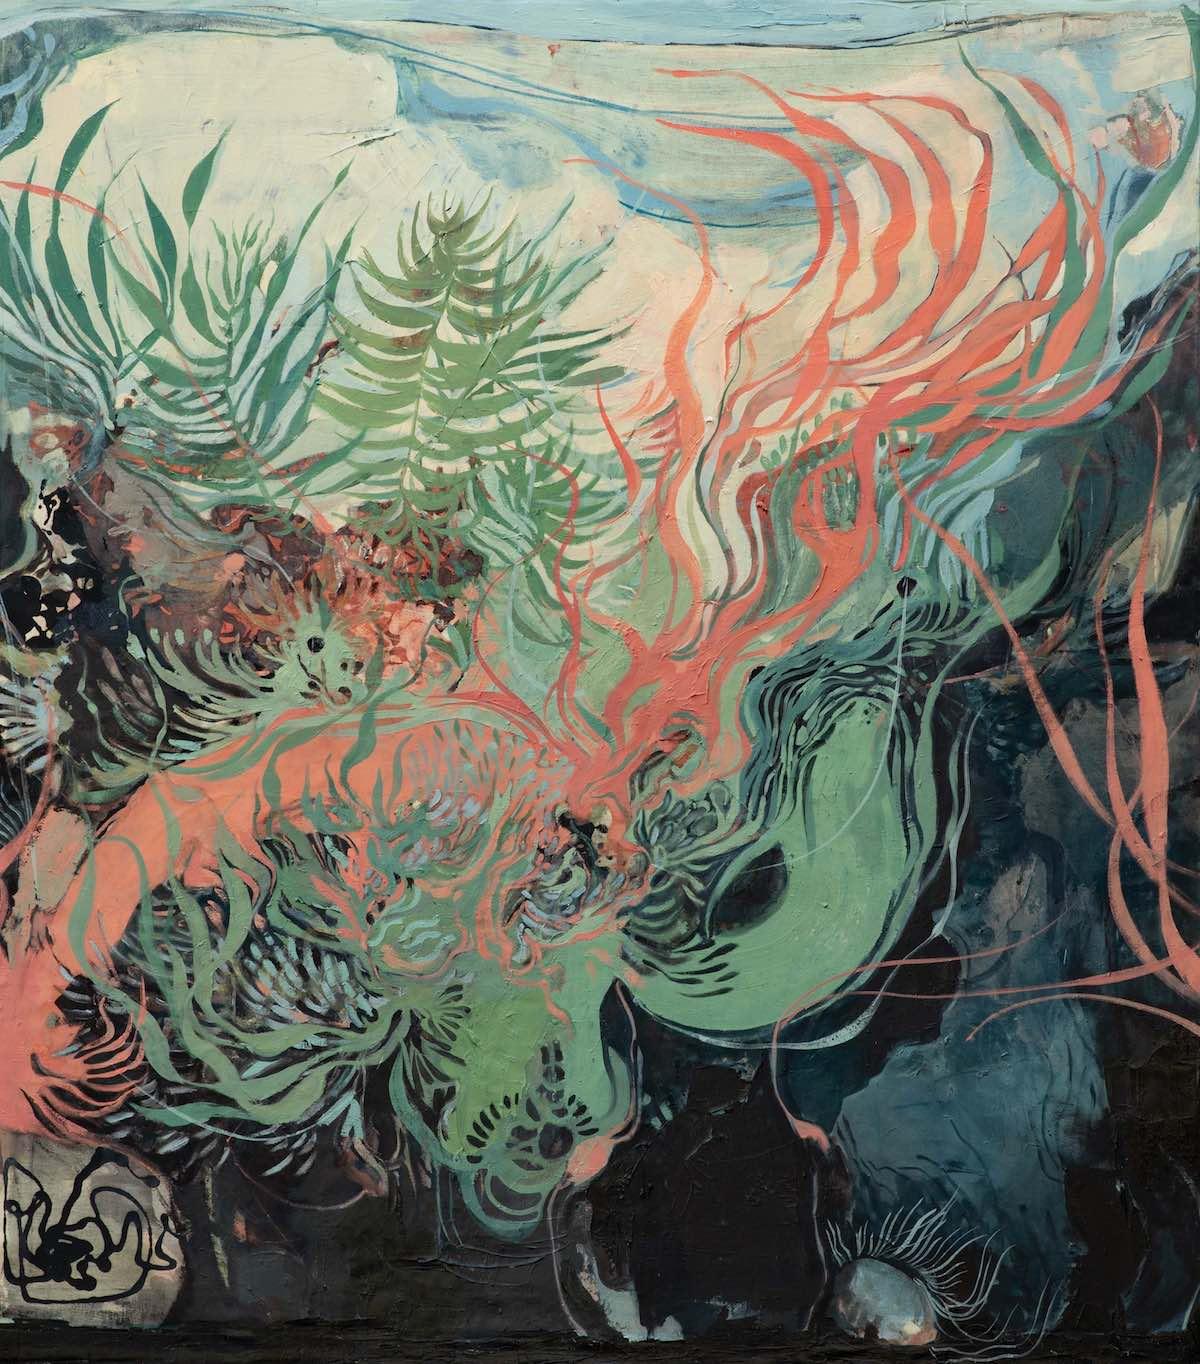 Maße: 135x120 cm ∙ Technik: Öl auf Leinwand ∙ Titel: Singing Reef ∙ Preis: 2.800 €  ☞ Kaufen